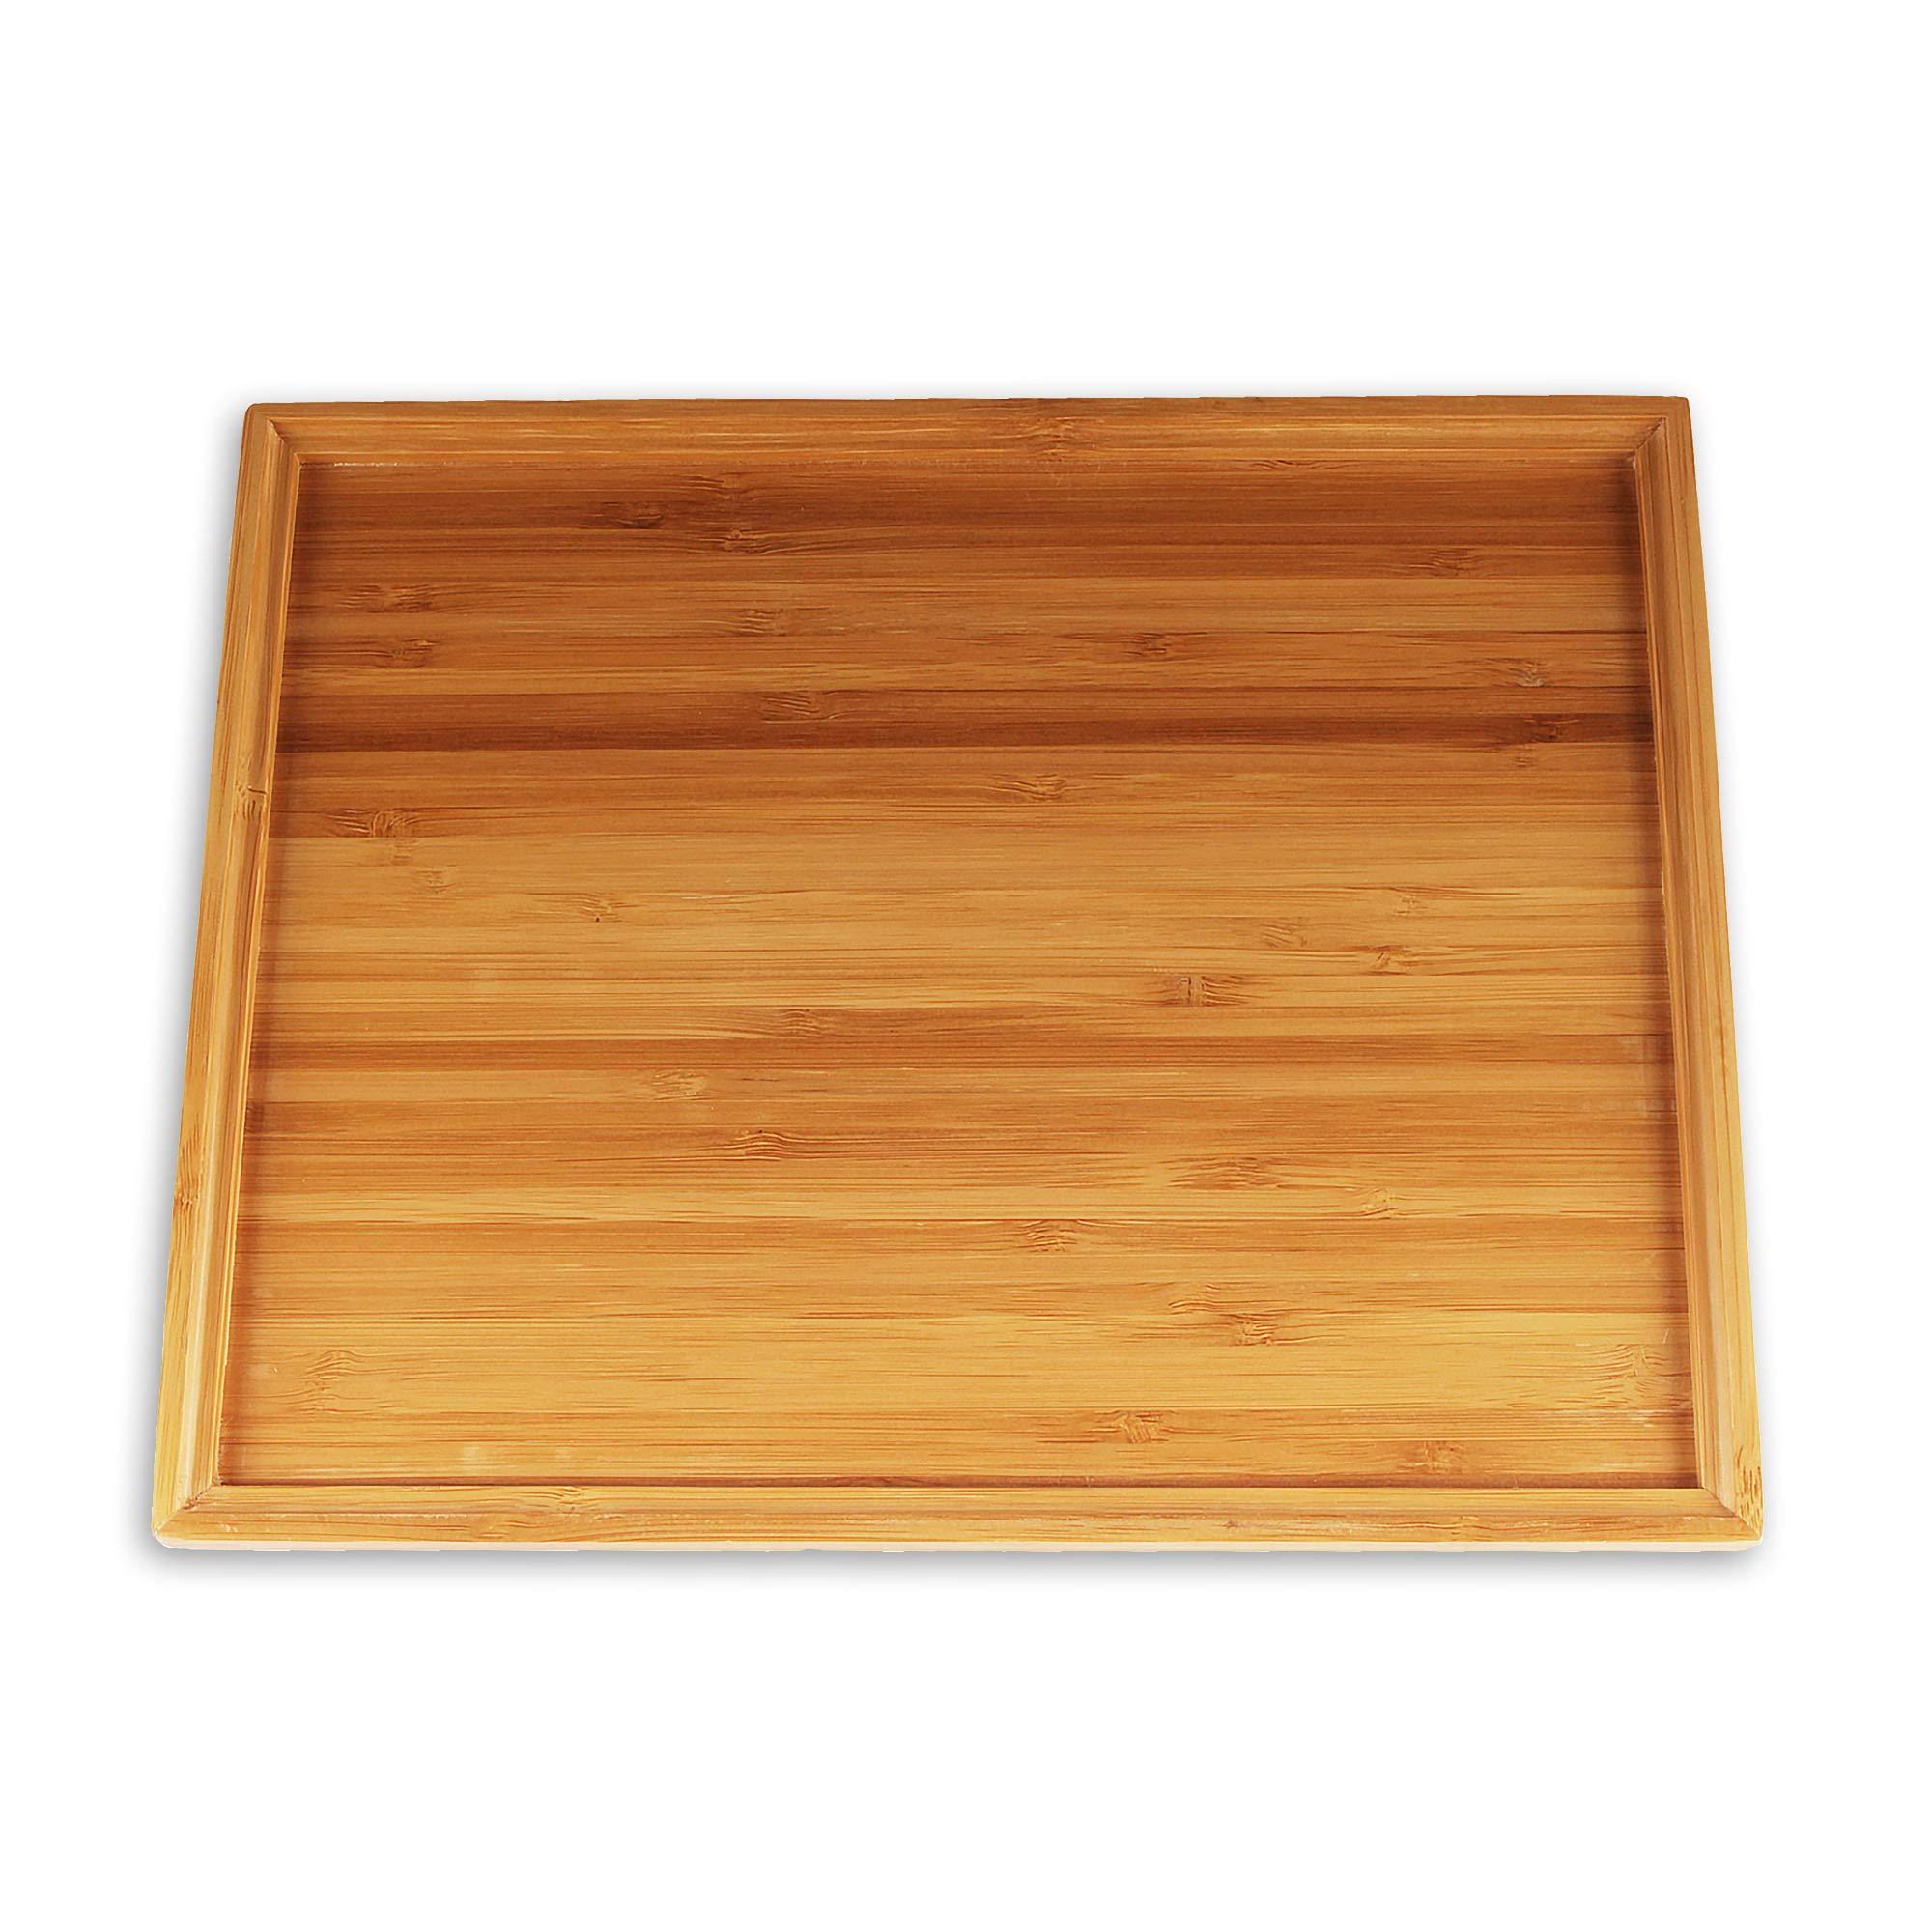 "Organic Bamboo Tea Serving Tray - 11""x8.9""x0.6"" - 3 Pieces"